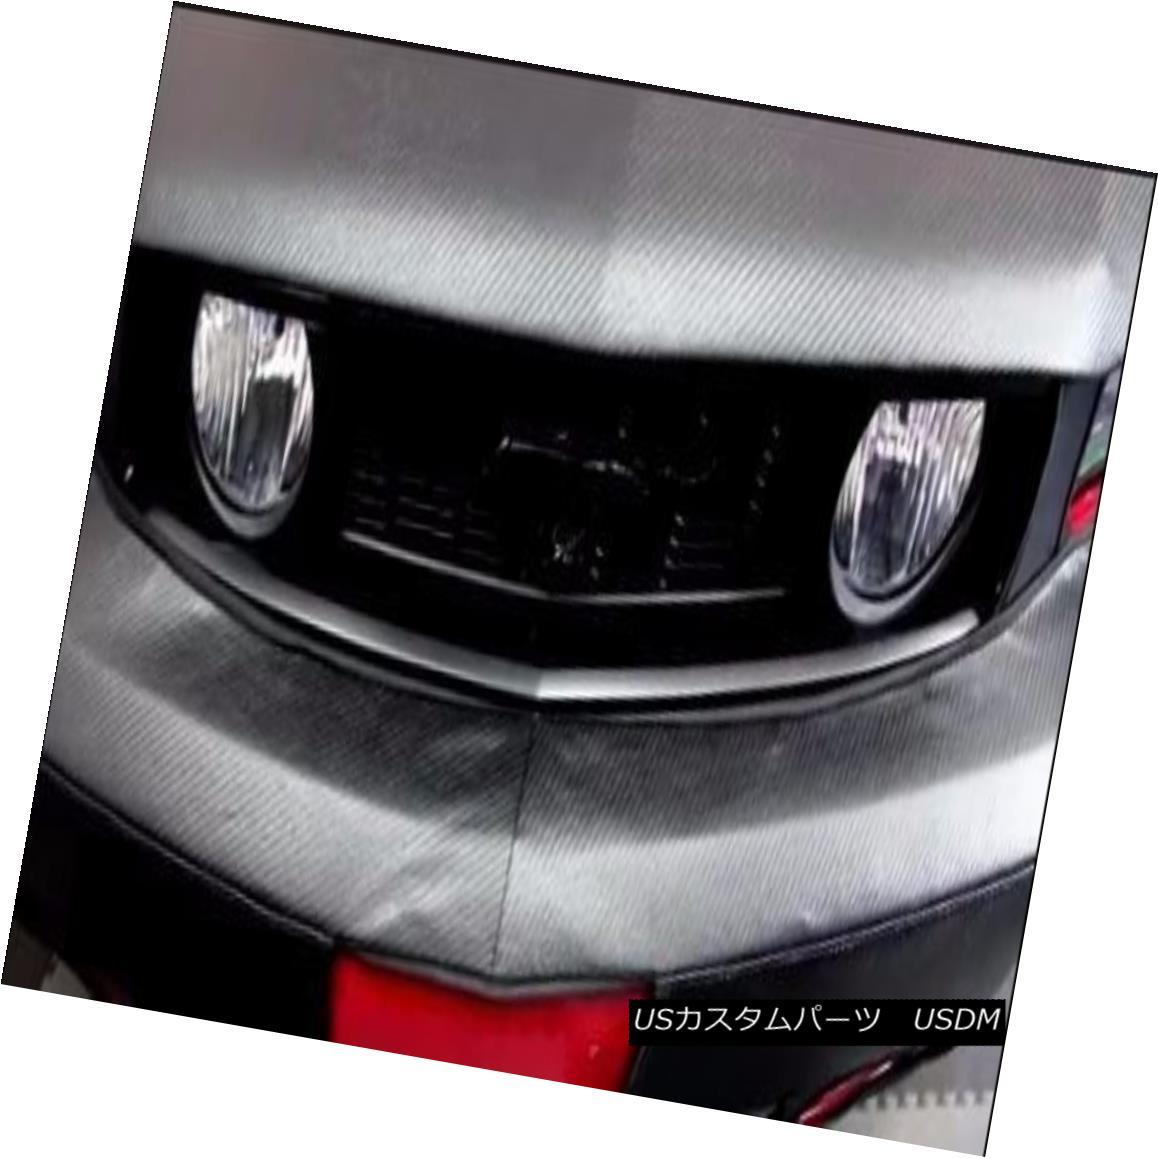 Colgan Front End Mask Bra 2pc Fits Mercedes Benz E320 2000-2002 W// Lic.Plate